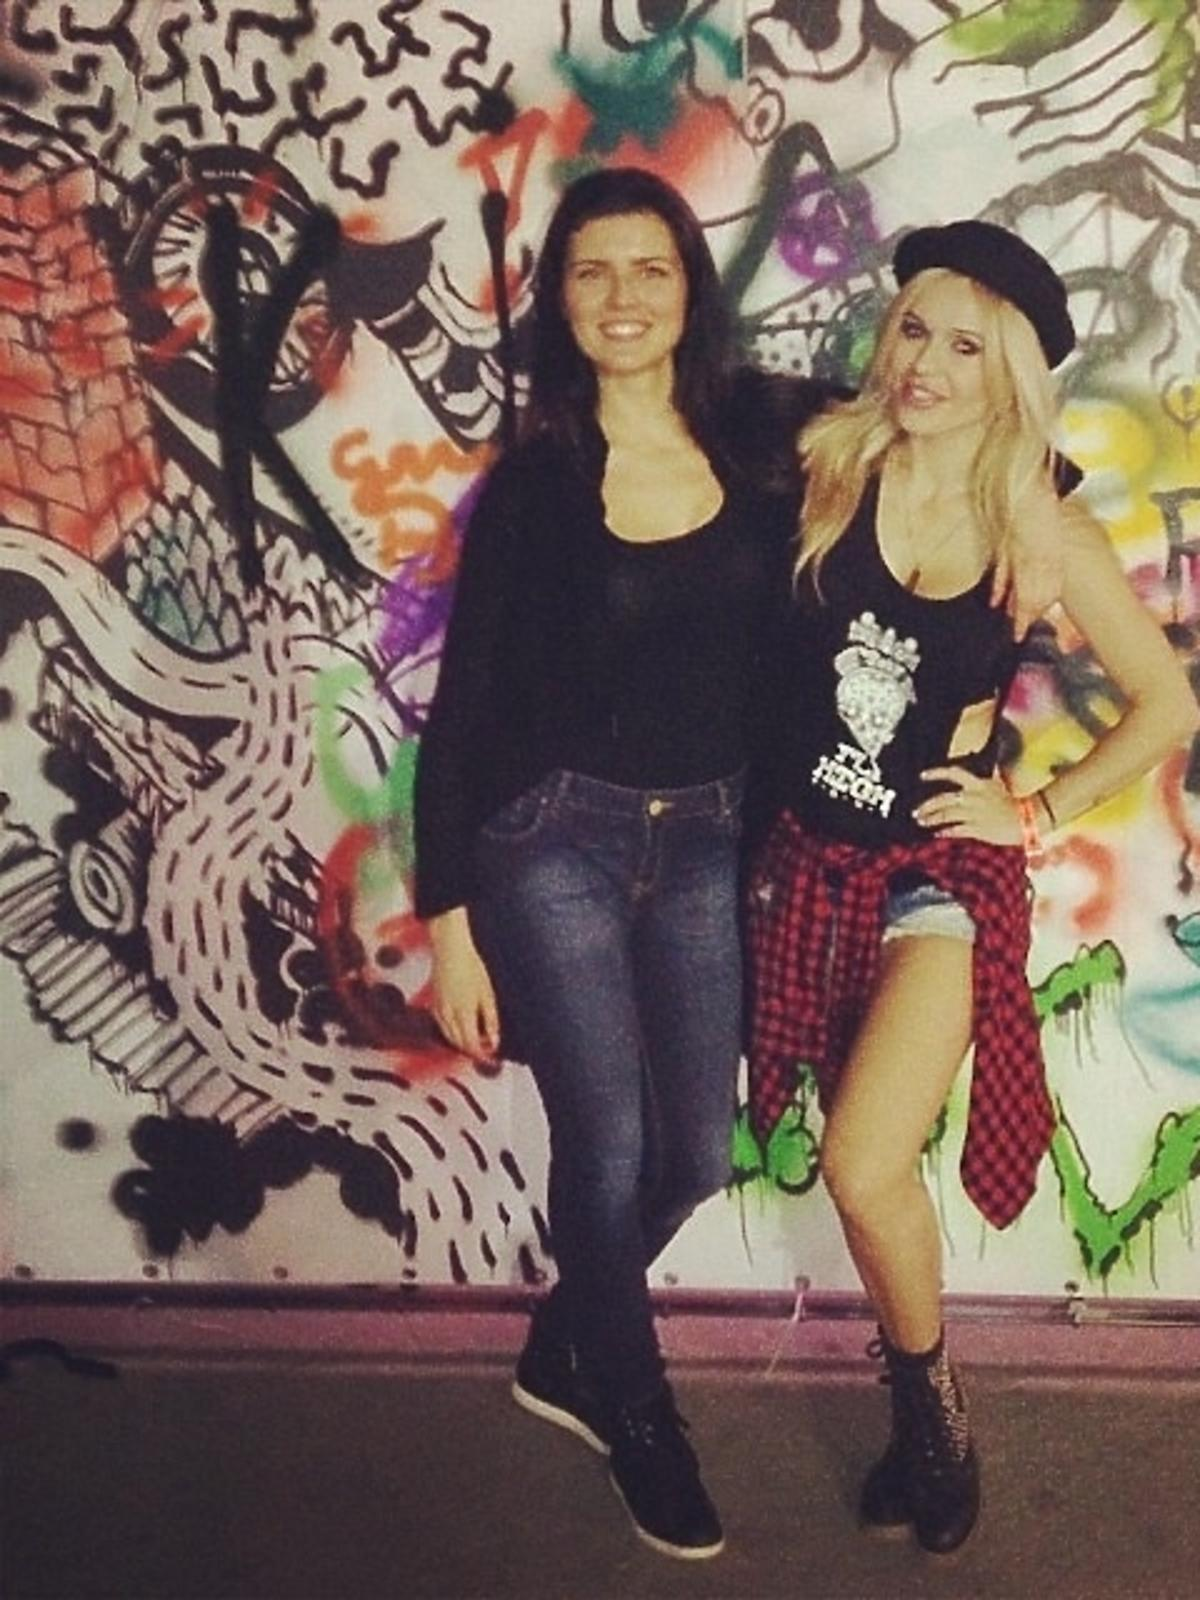 Doda i Małgorzata Leitner na koncercie Aerosmith